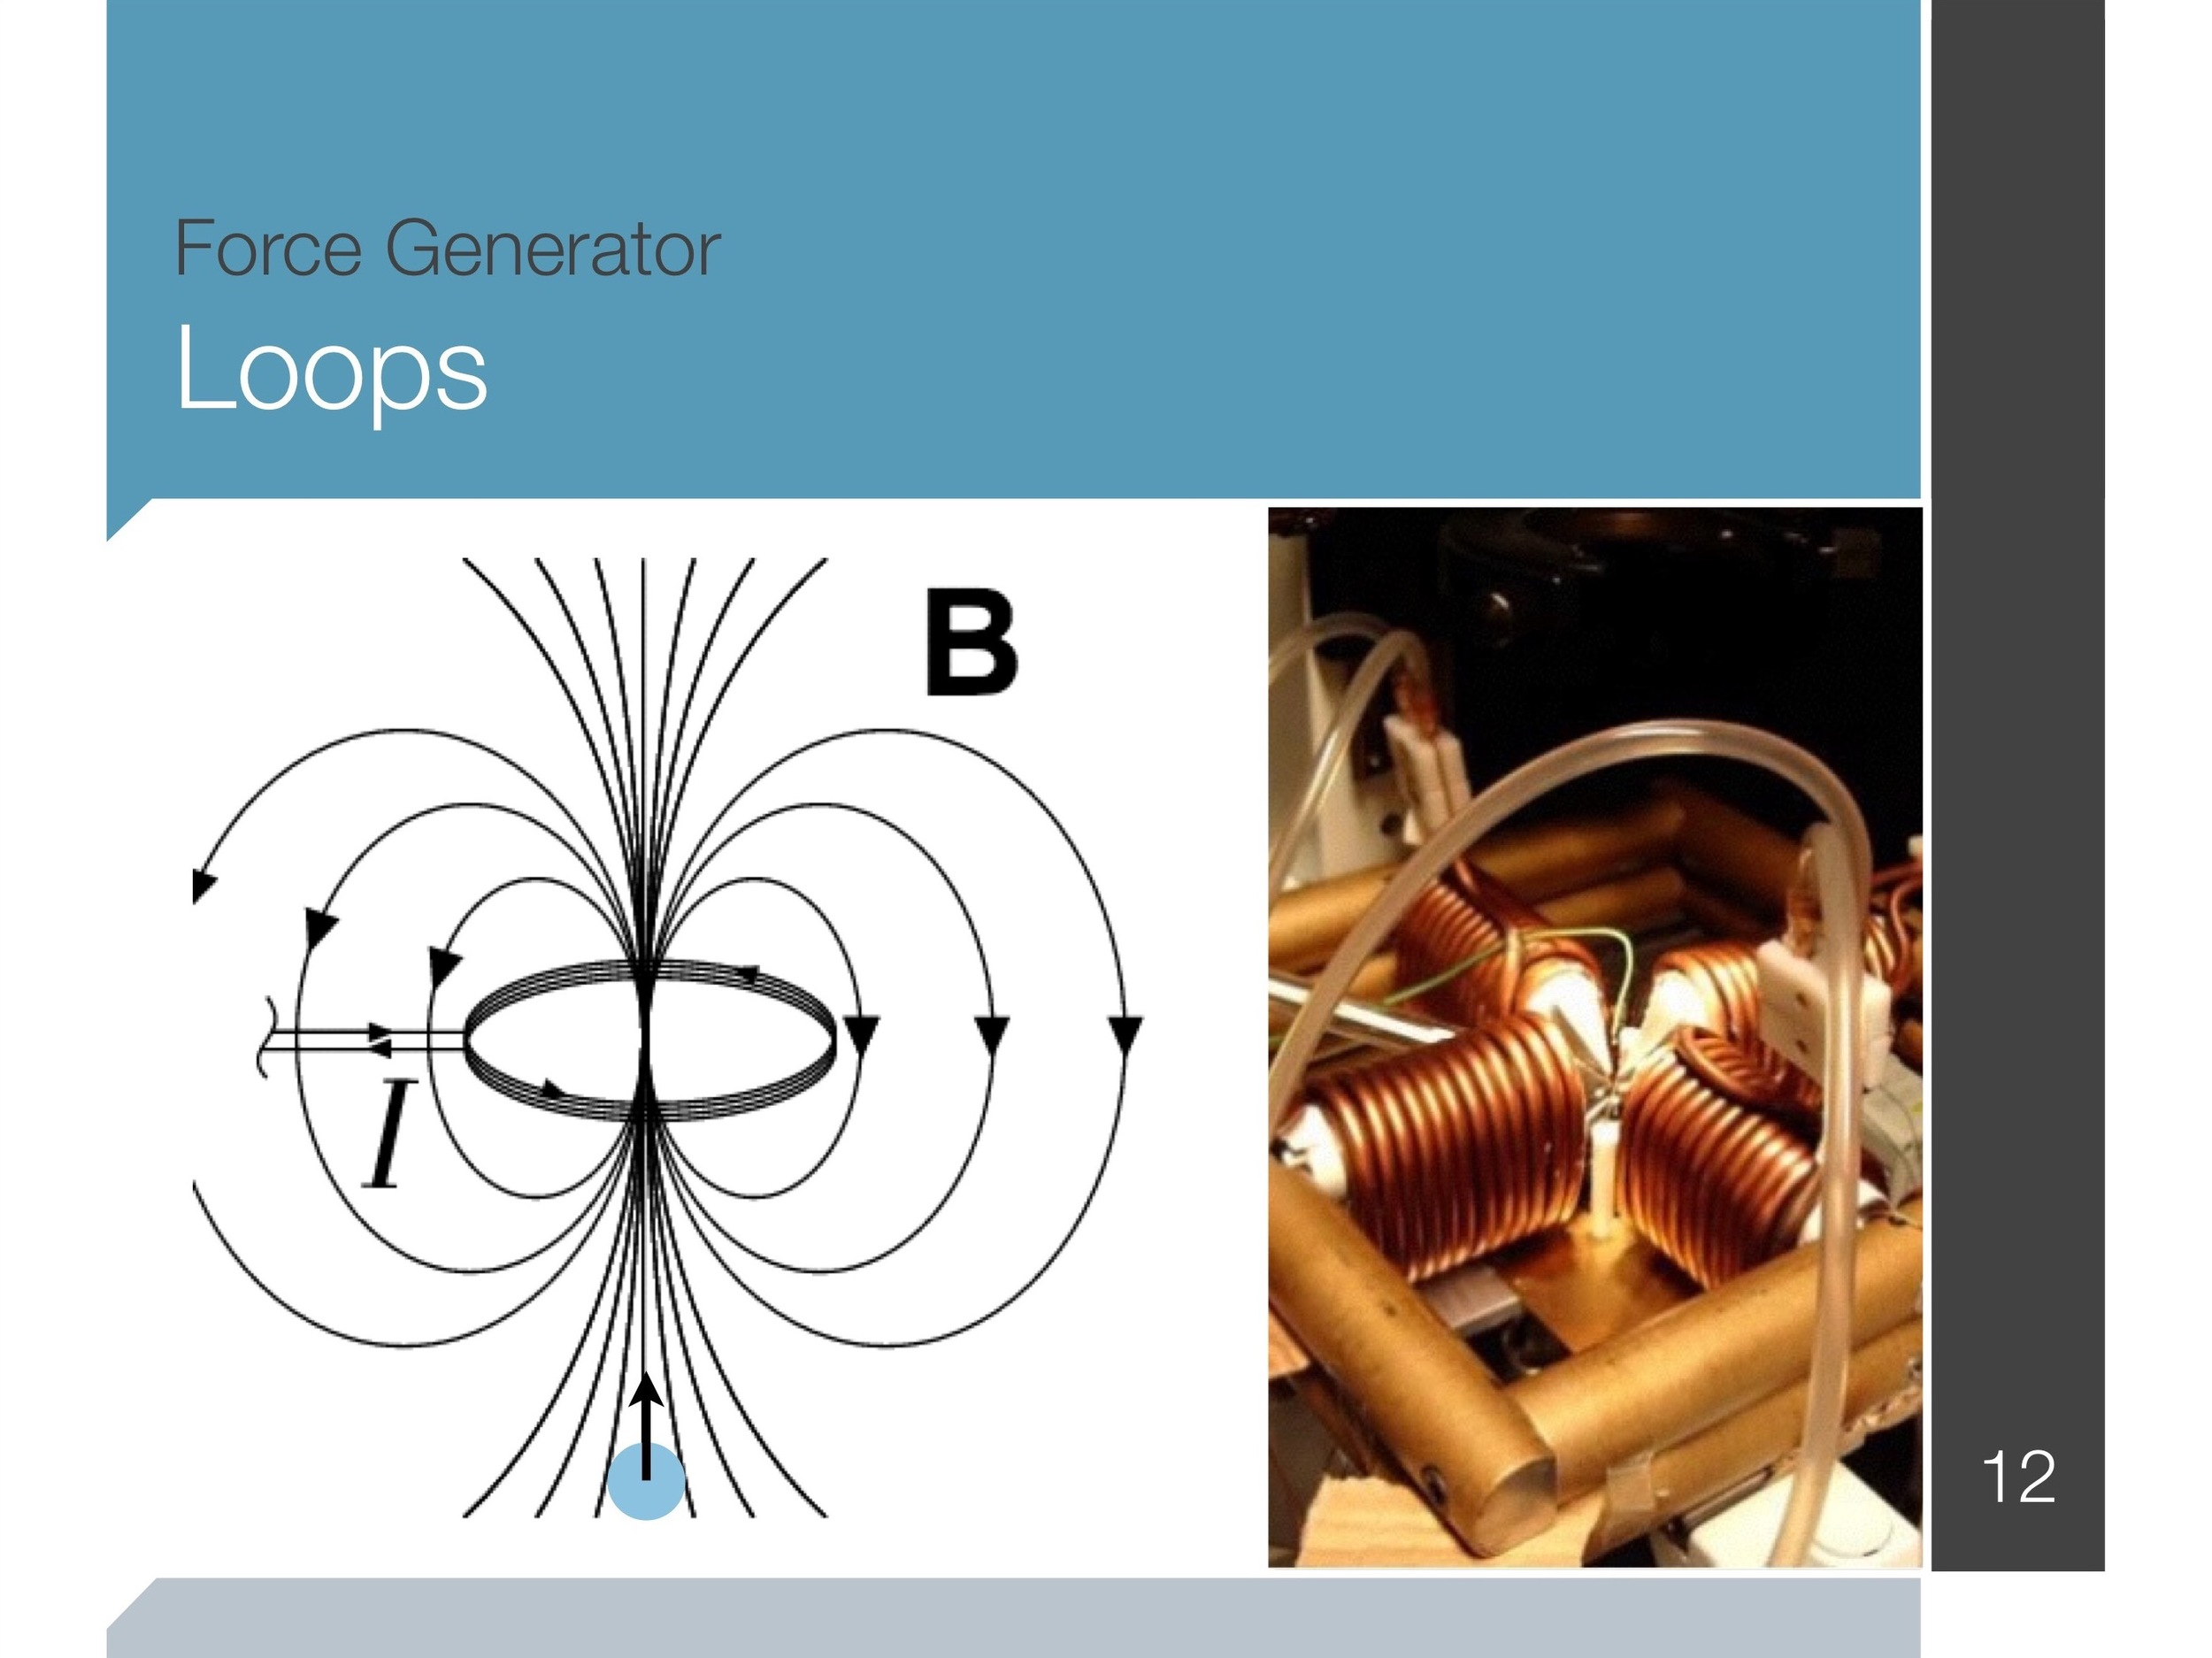 magnetic-tweezers_presentation 18 copy.jpeg